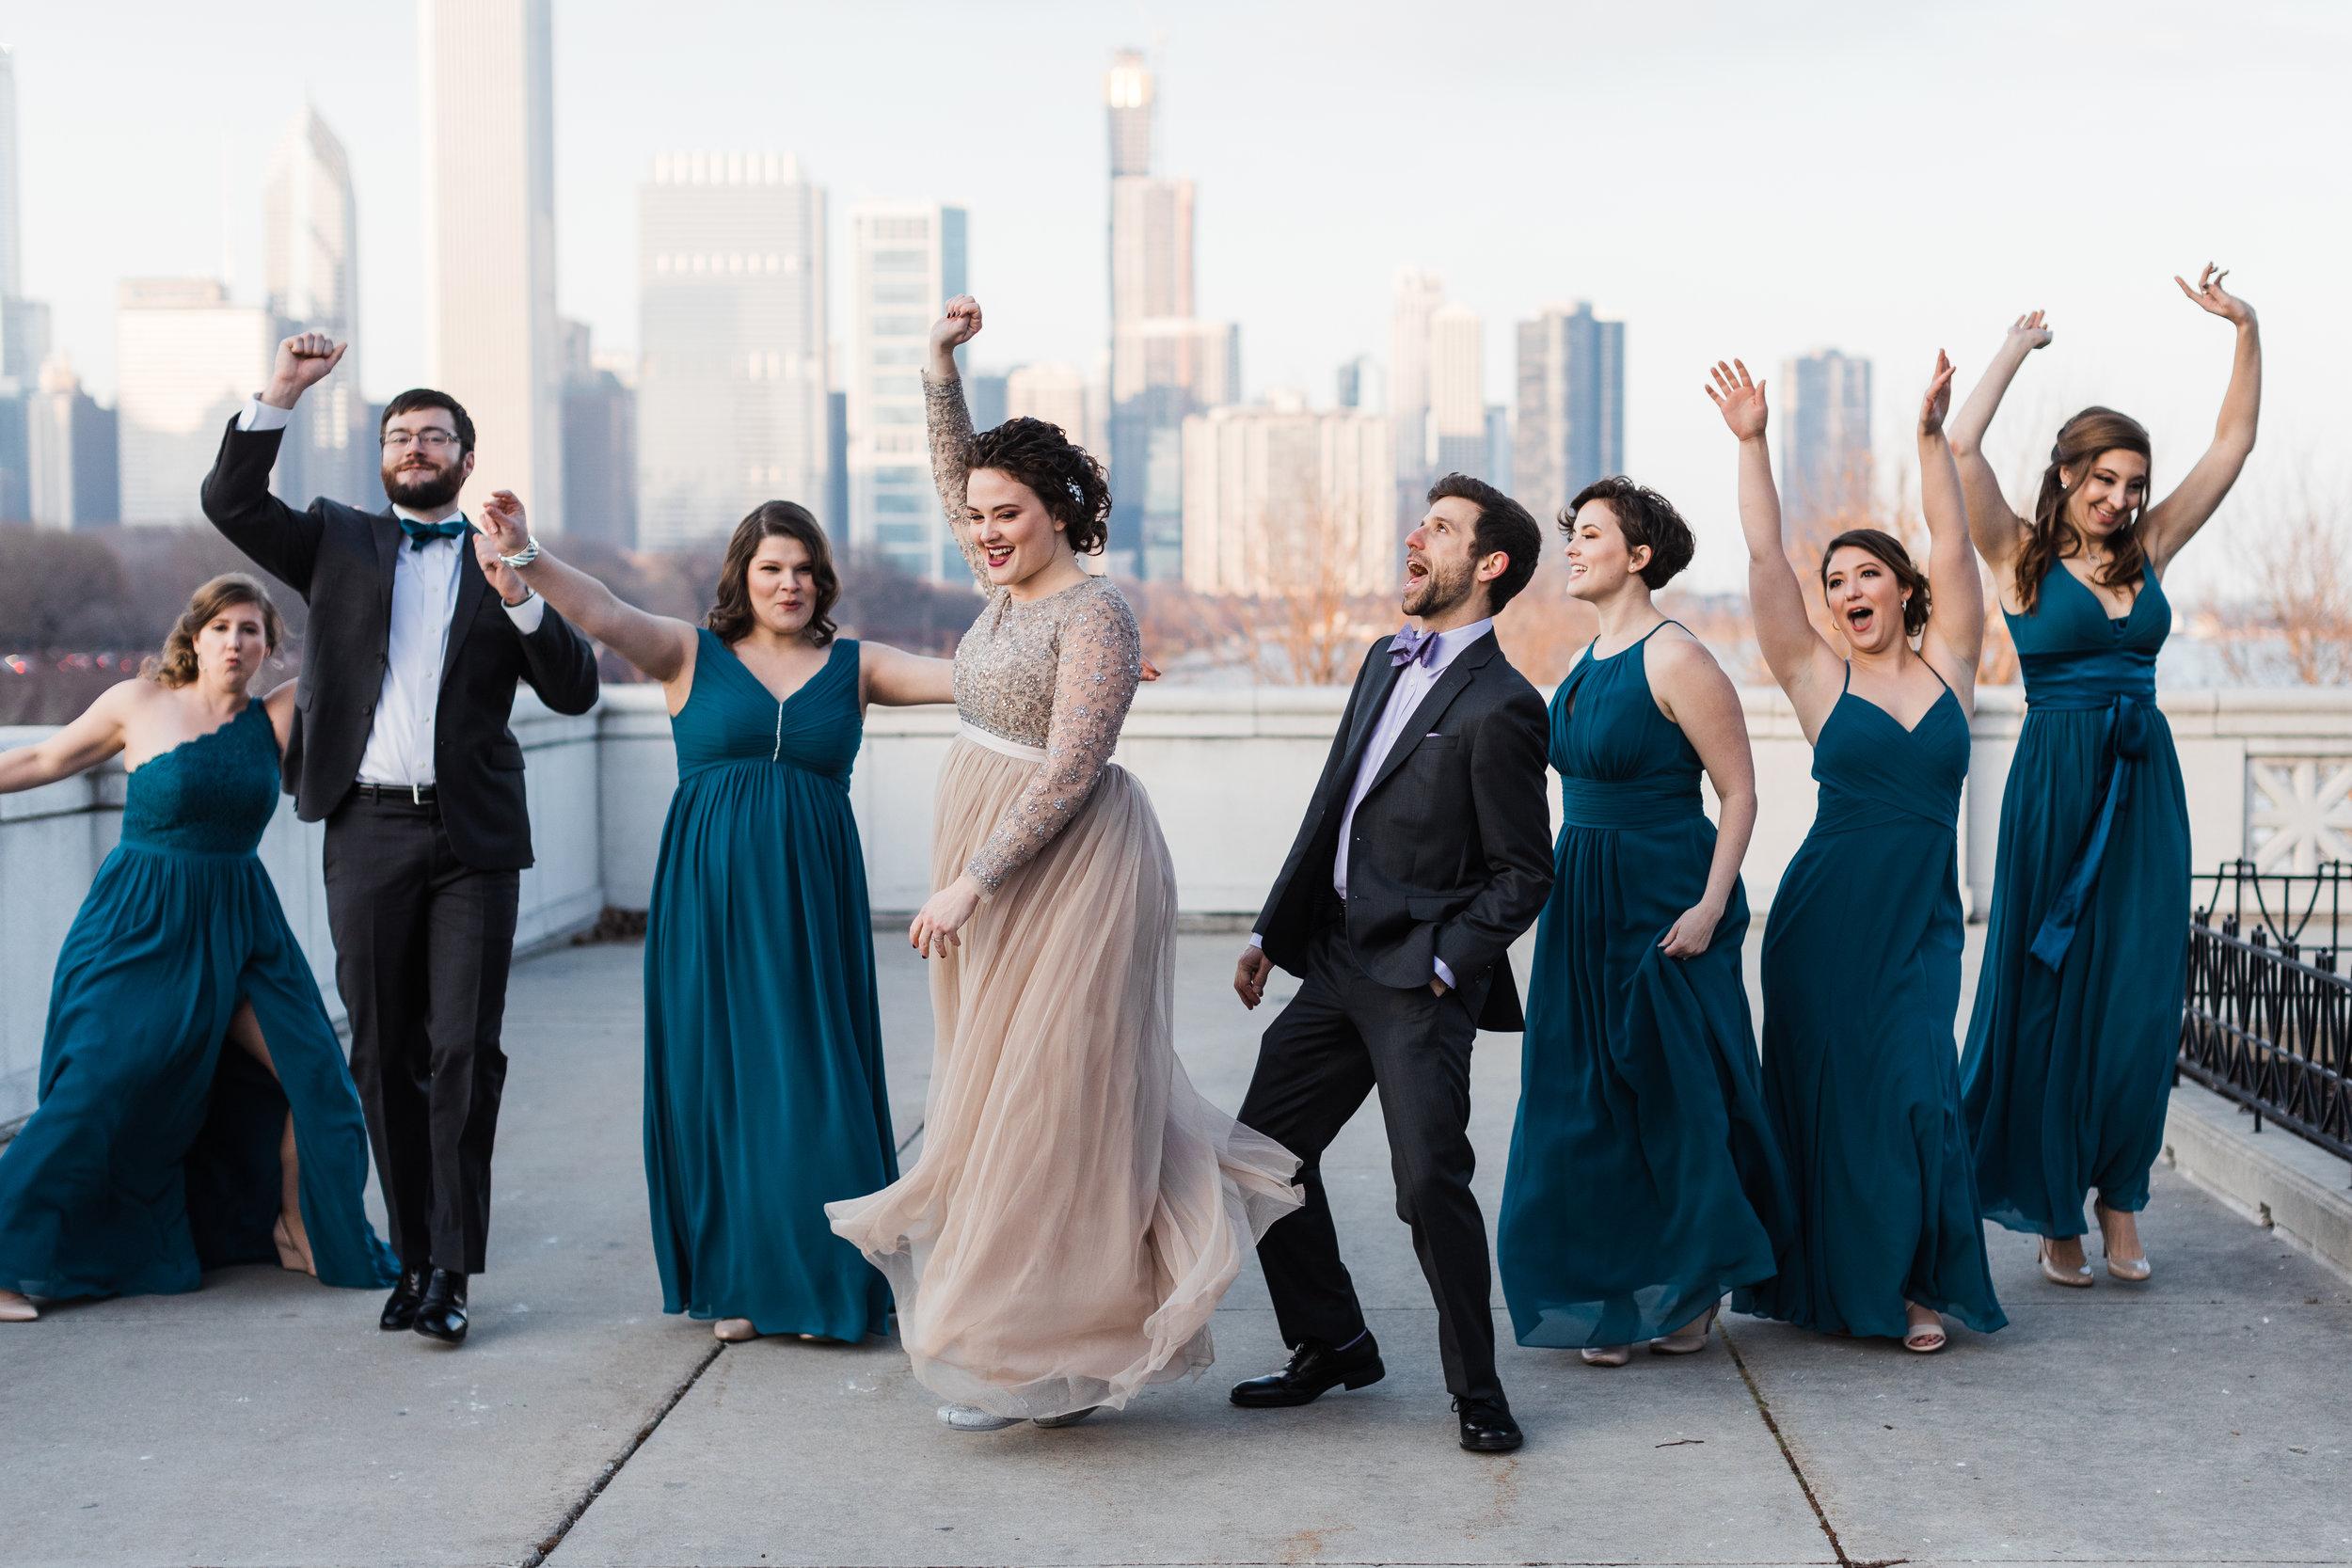 traverse_city_wedding_photographer_destination_reception_chicago_rockhill2.jpg